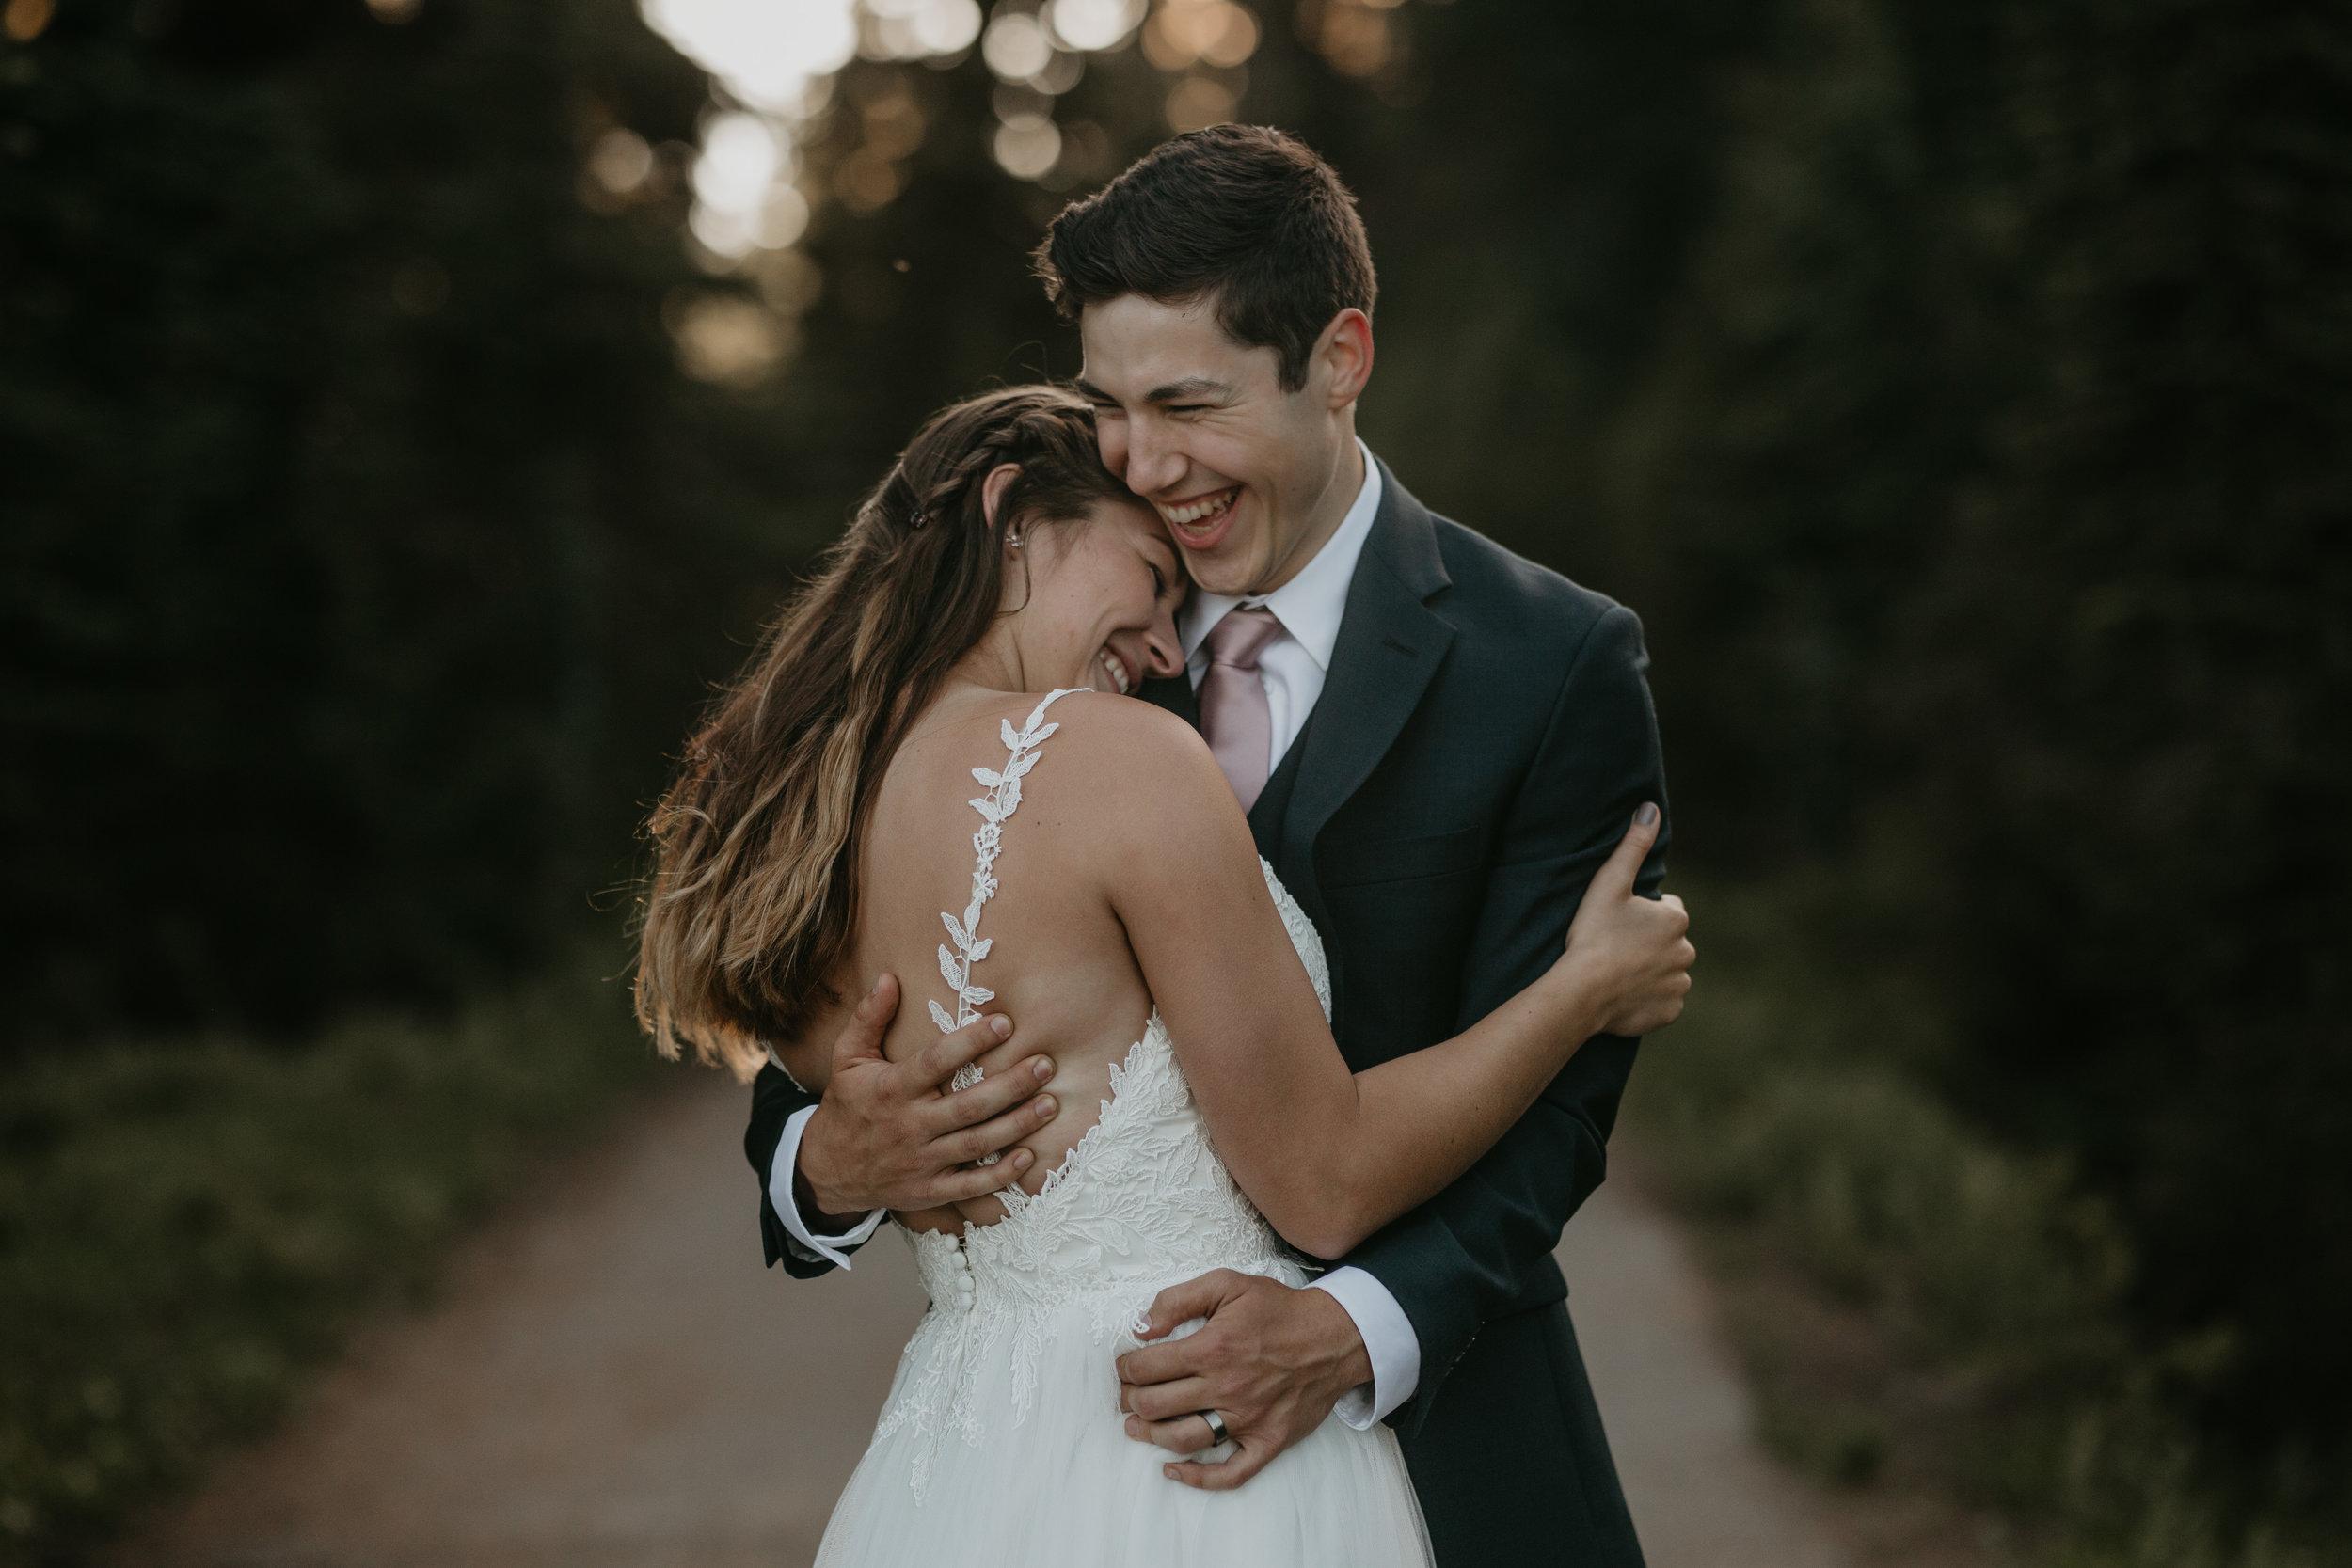 Nicole-Daacke-Photography-Mt-Rainier-elopement-photographer-washington-mountain-epic-wedding-photography-wildflowers-at-rainier-pine-tree-cloudy-summer-day-at-mountain-rainier-35.jpg